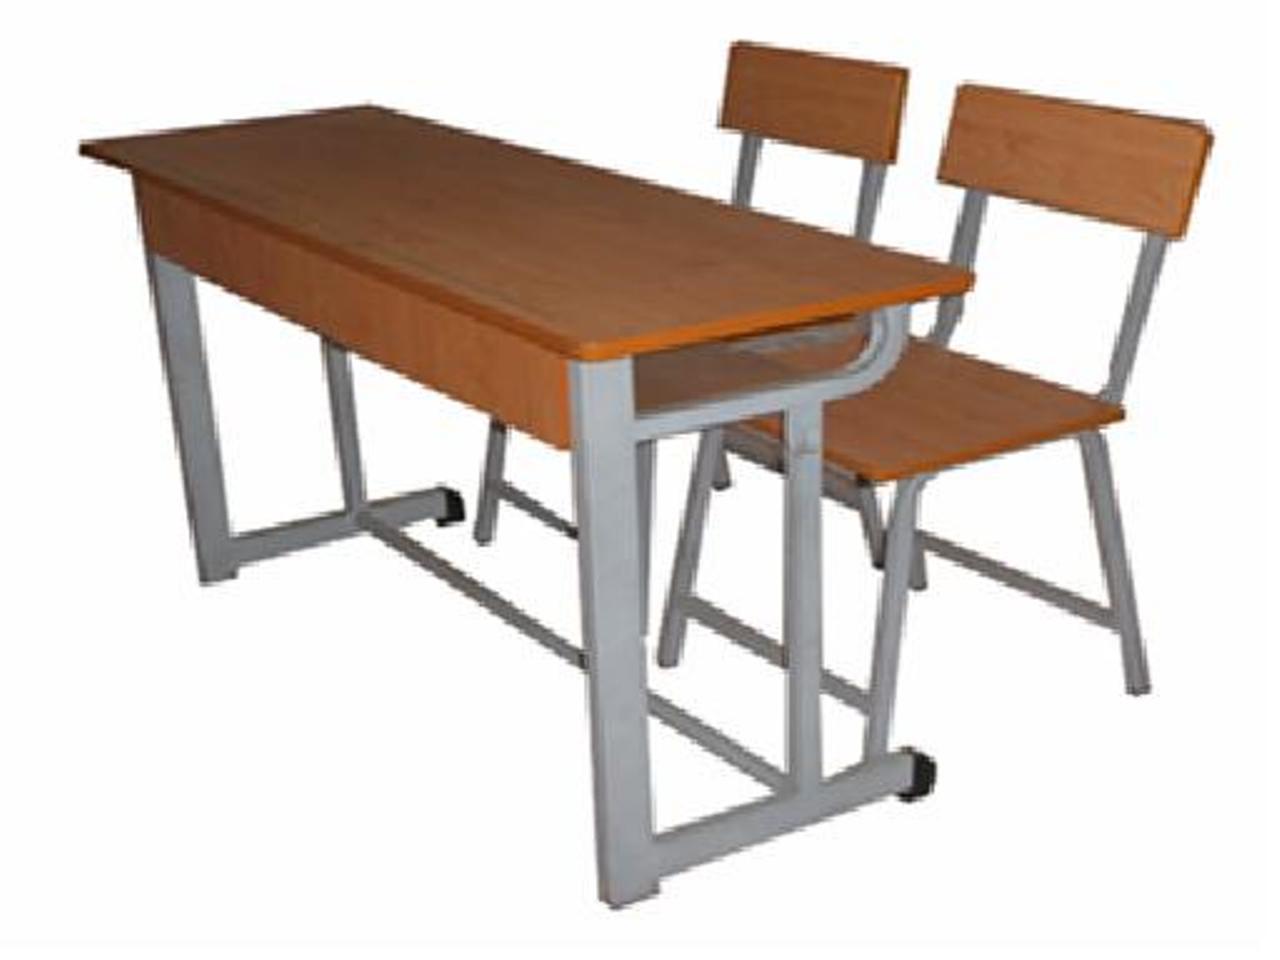 Bàn ghế học sinh SU-01